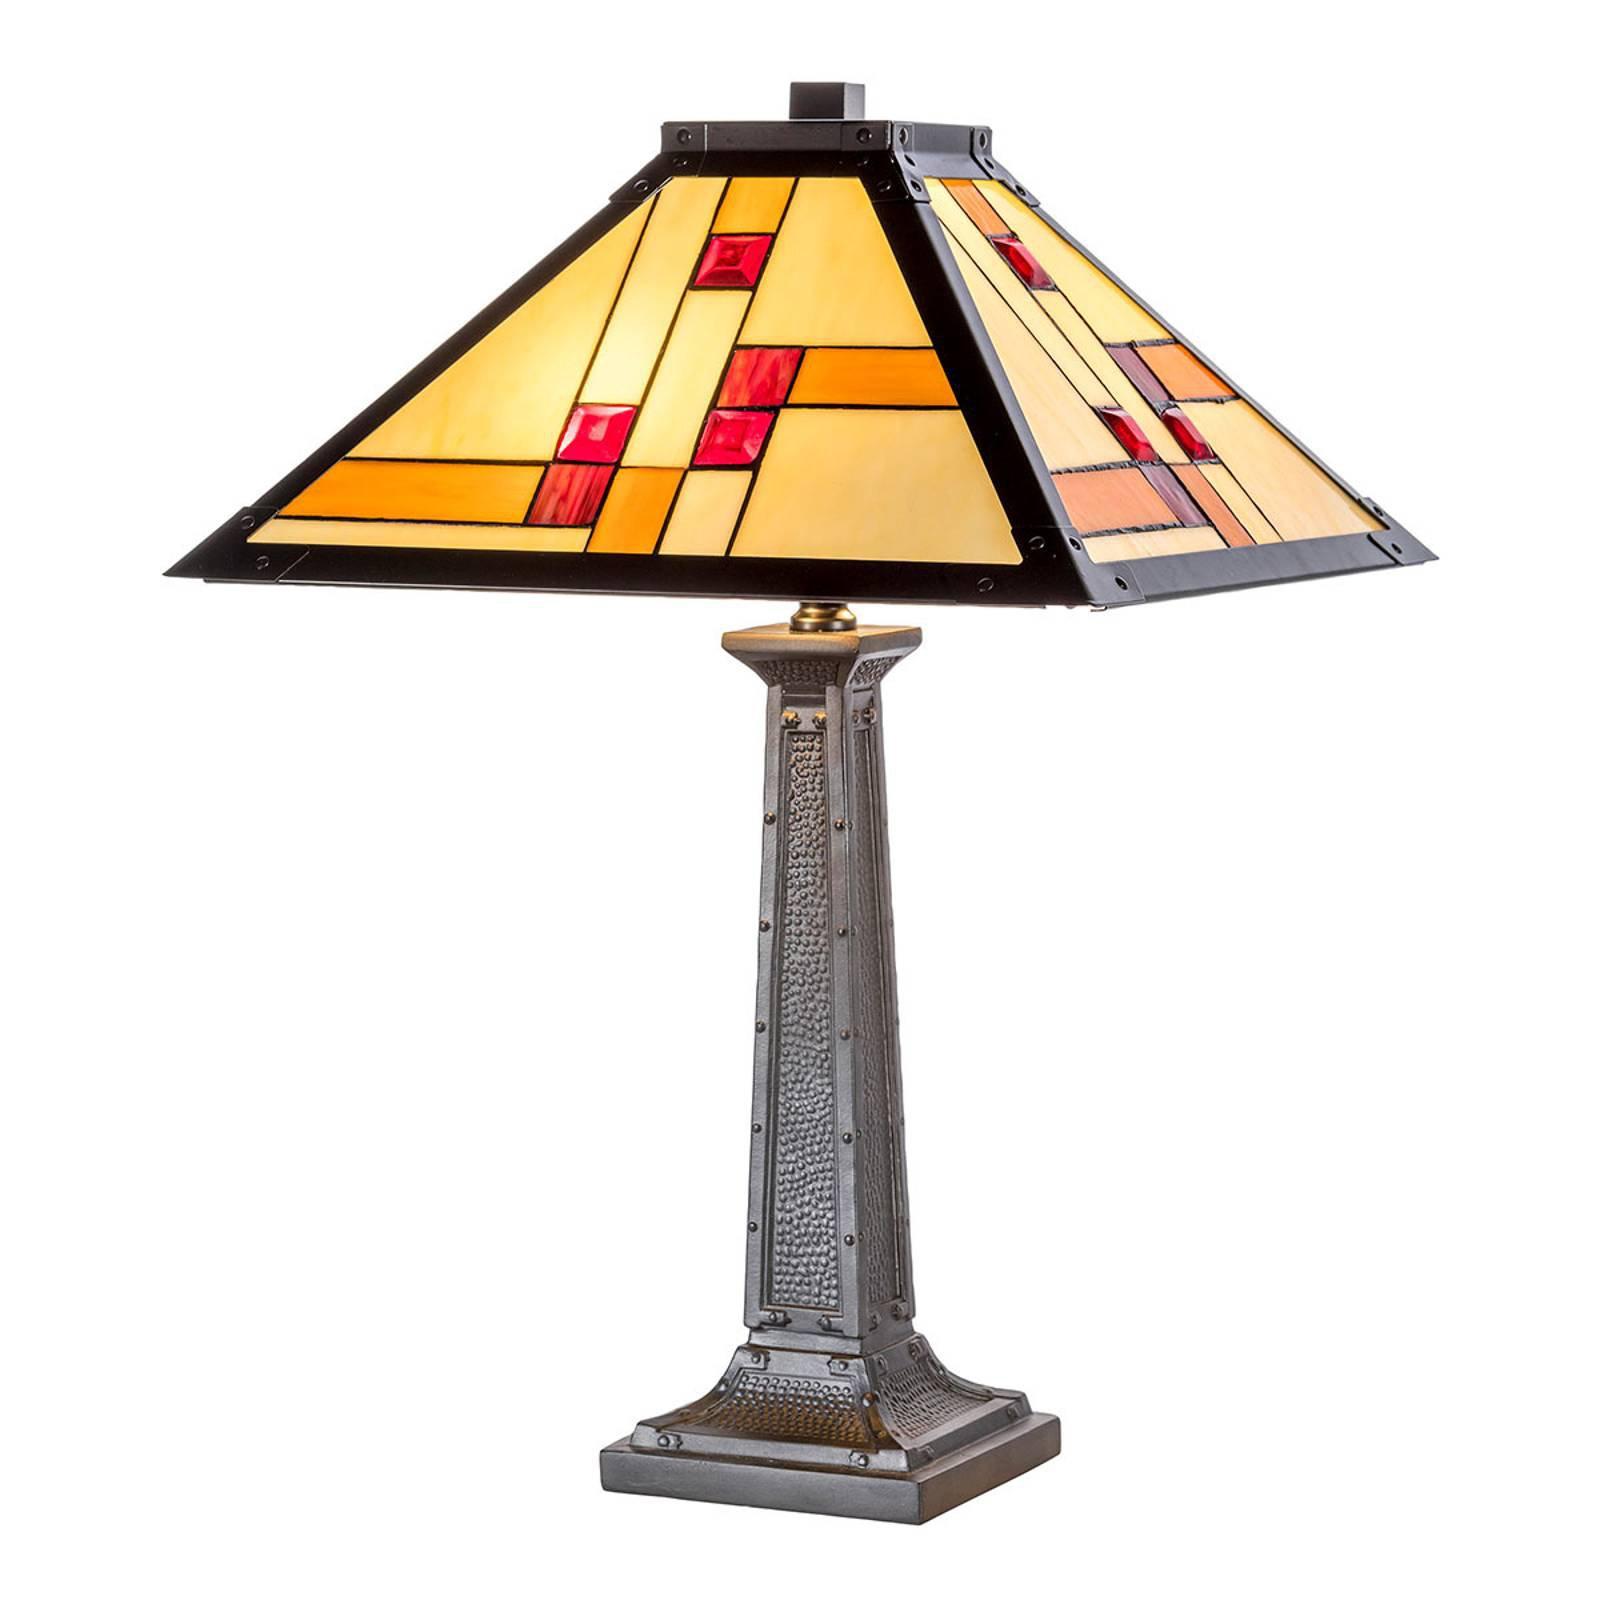 Bordlampe KT1836-40+P1836 i Tiffany-stil